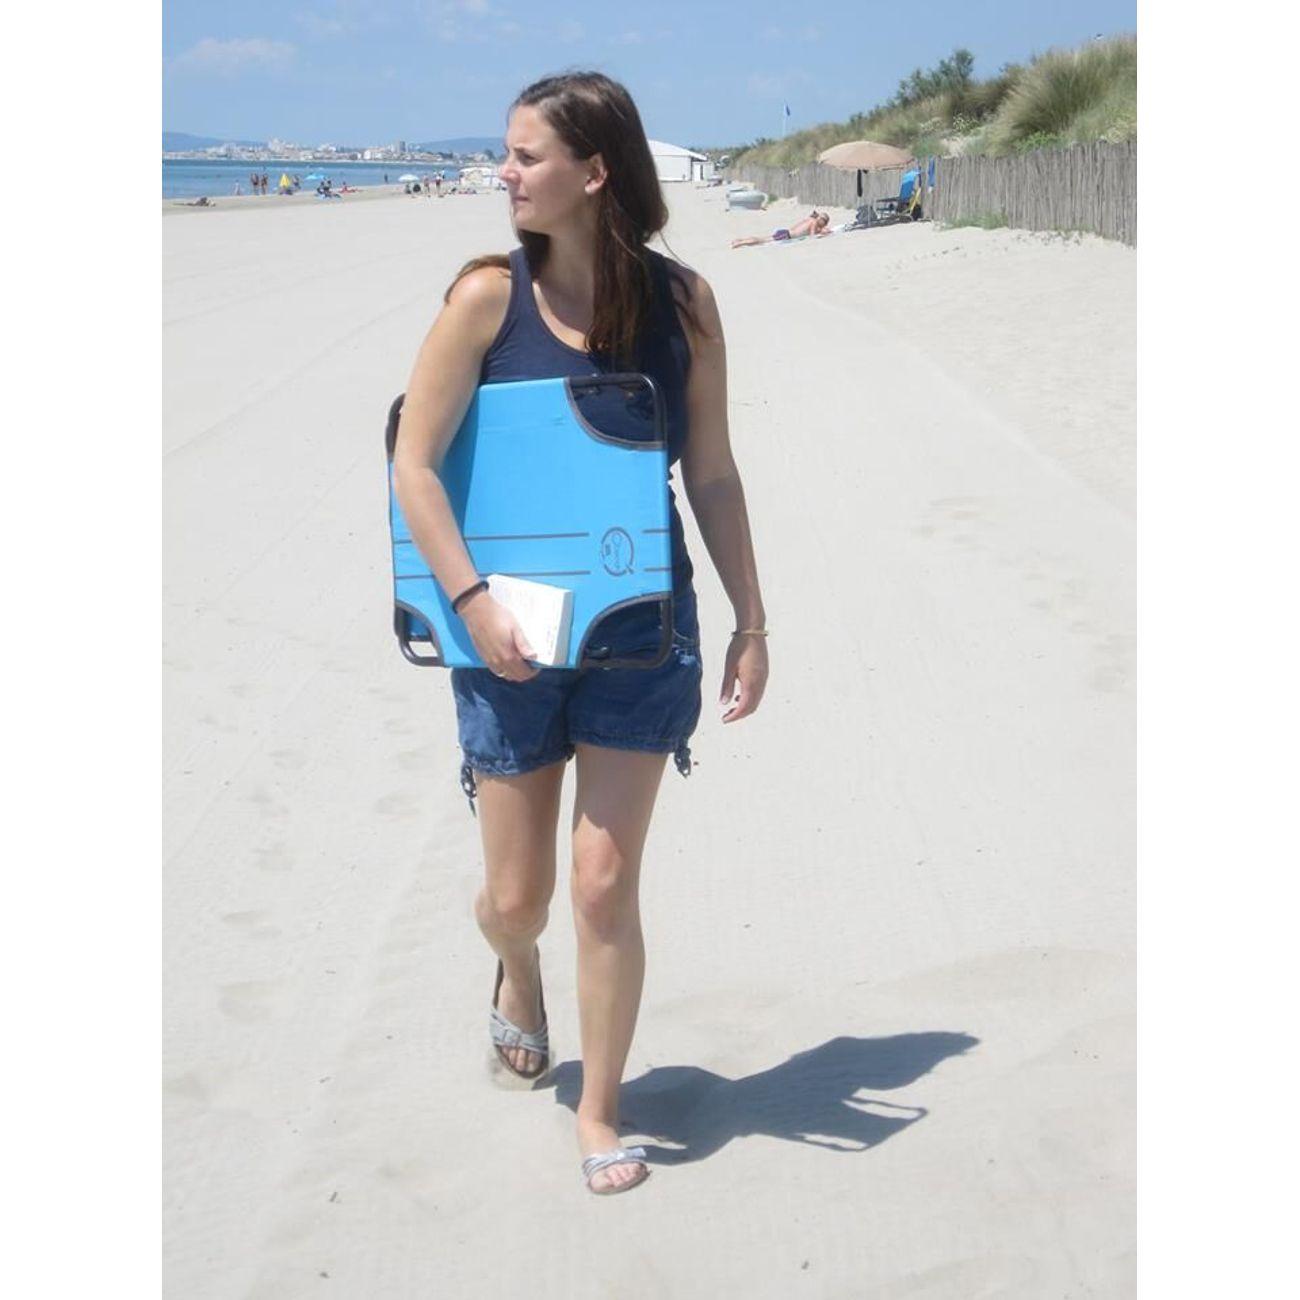 Plage  O'CAMP Chaise de plage Bleu turquoise - O'Beach - Dimensions : 45 x 163  x 44 cm